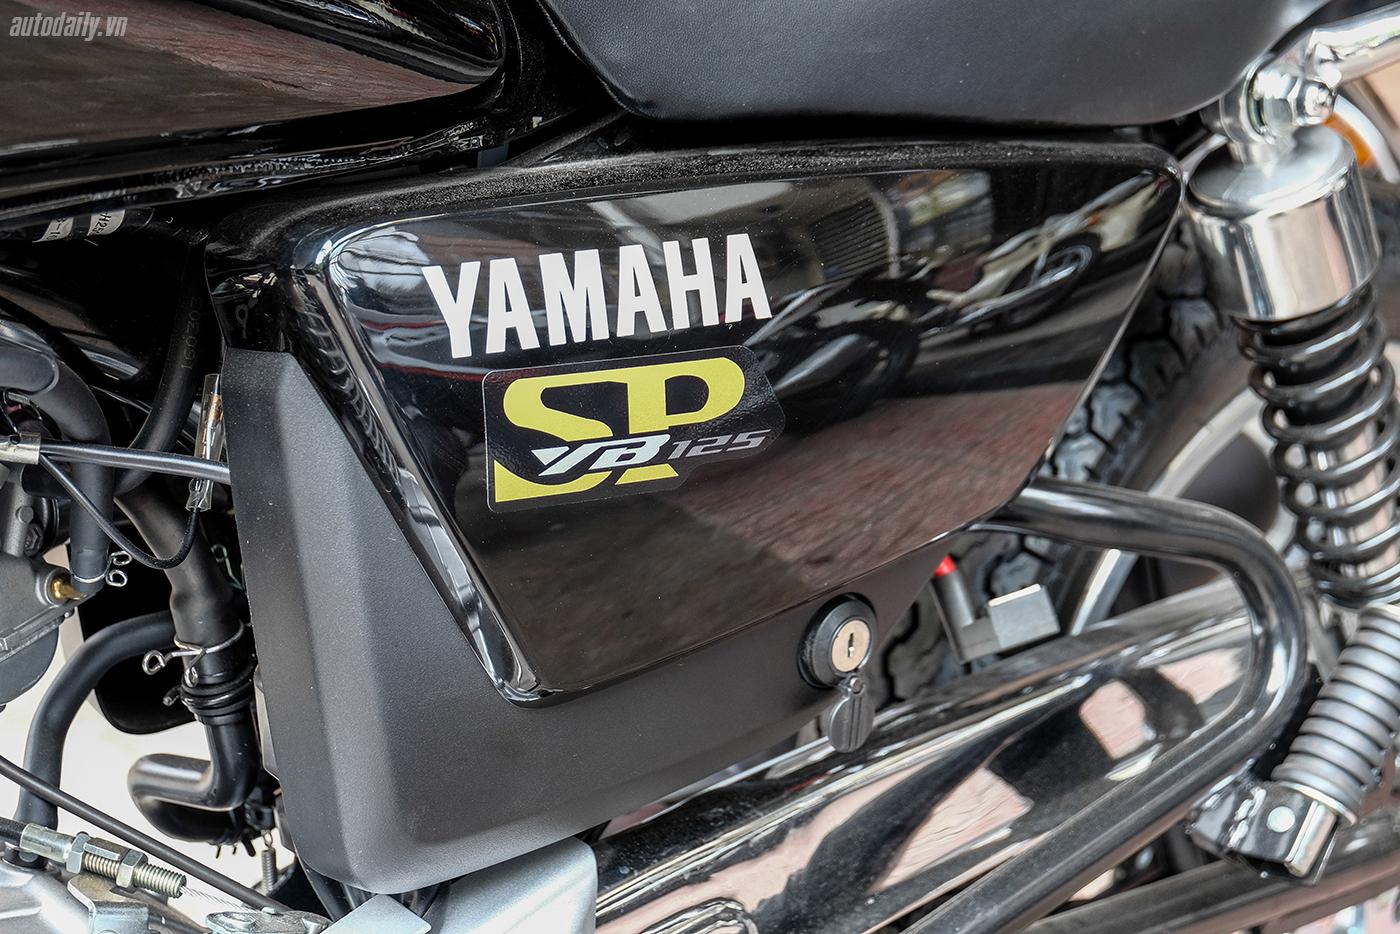 yamaha-yb125-sp-26.jpg